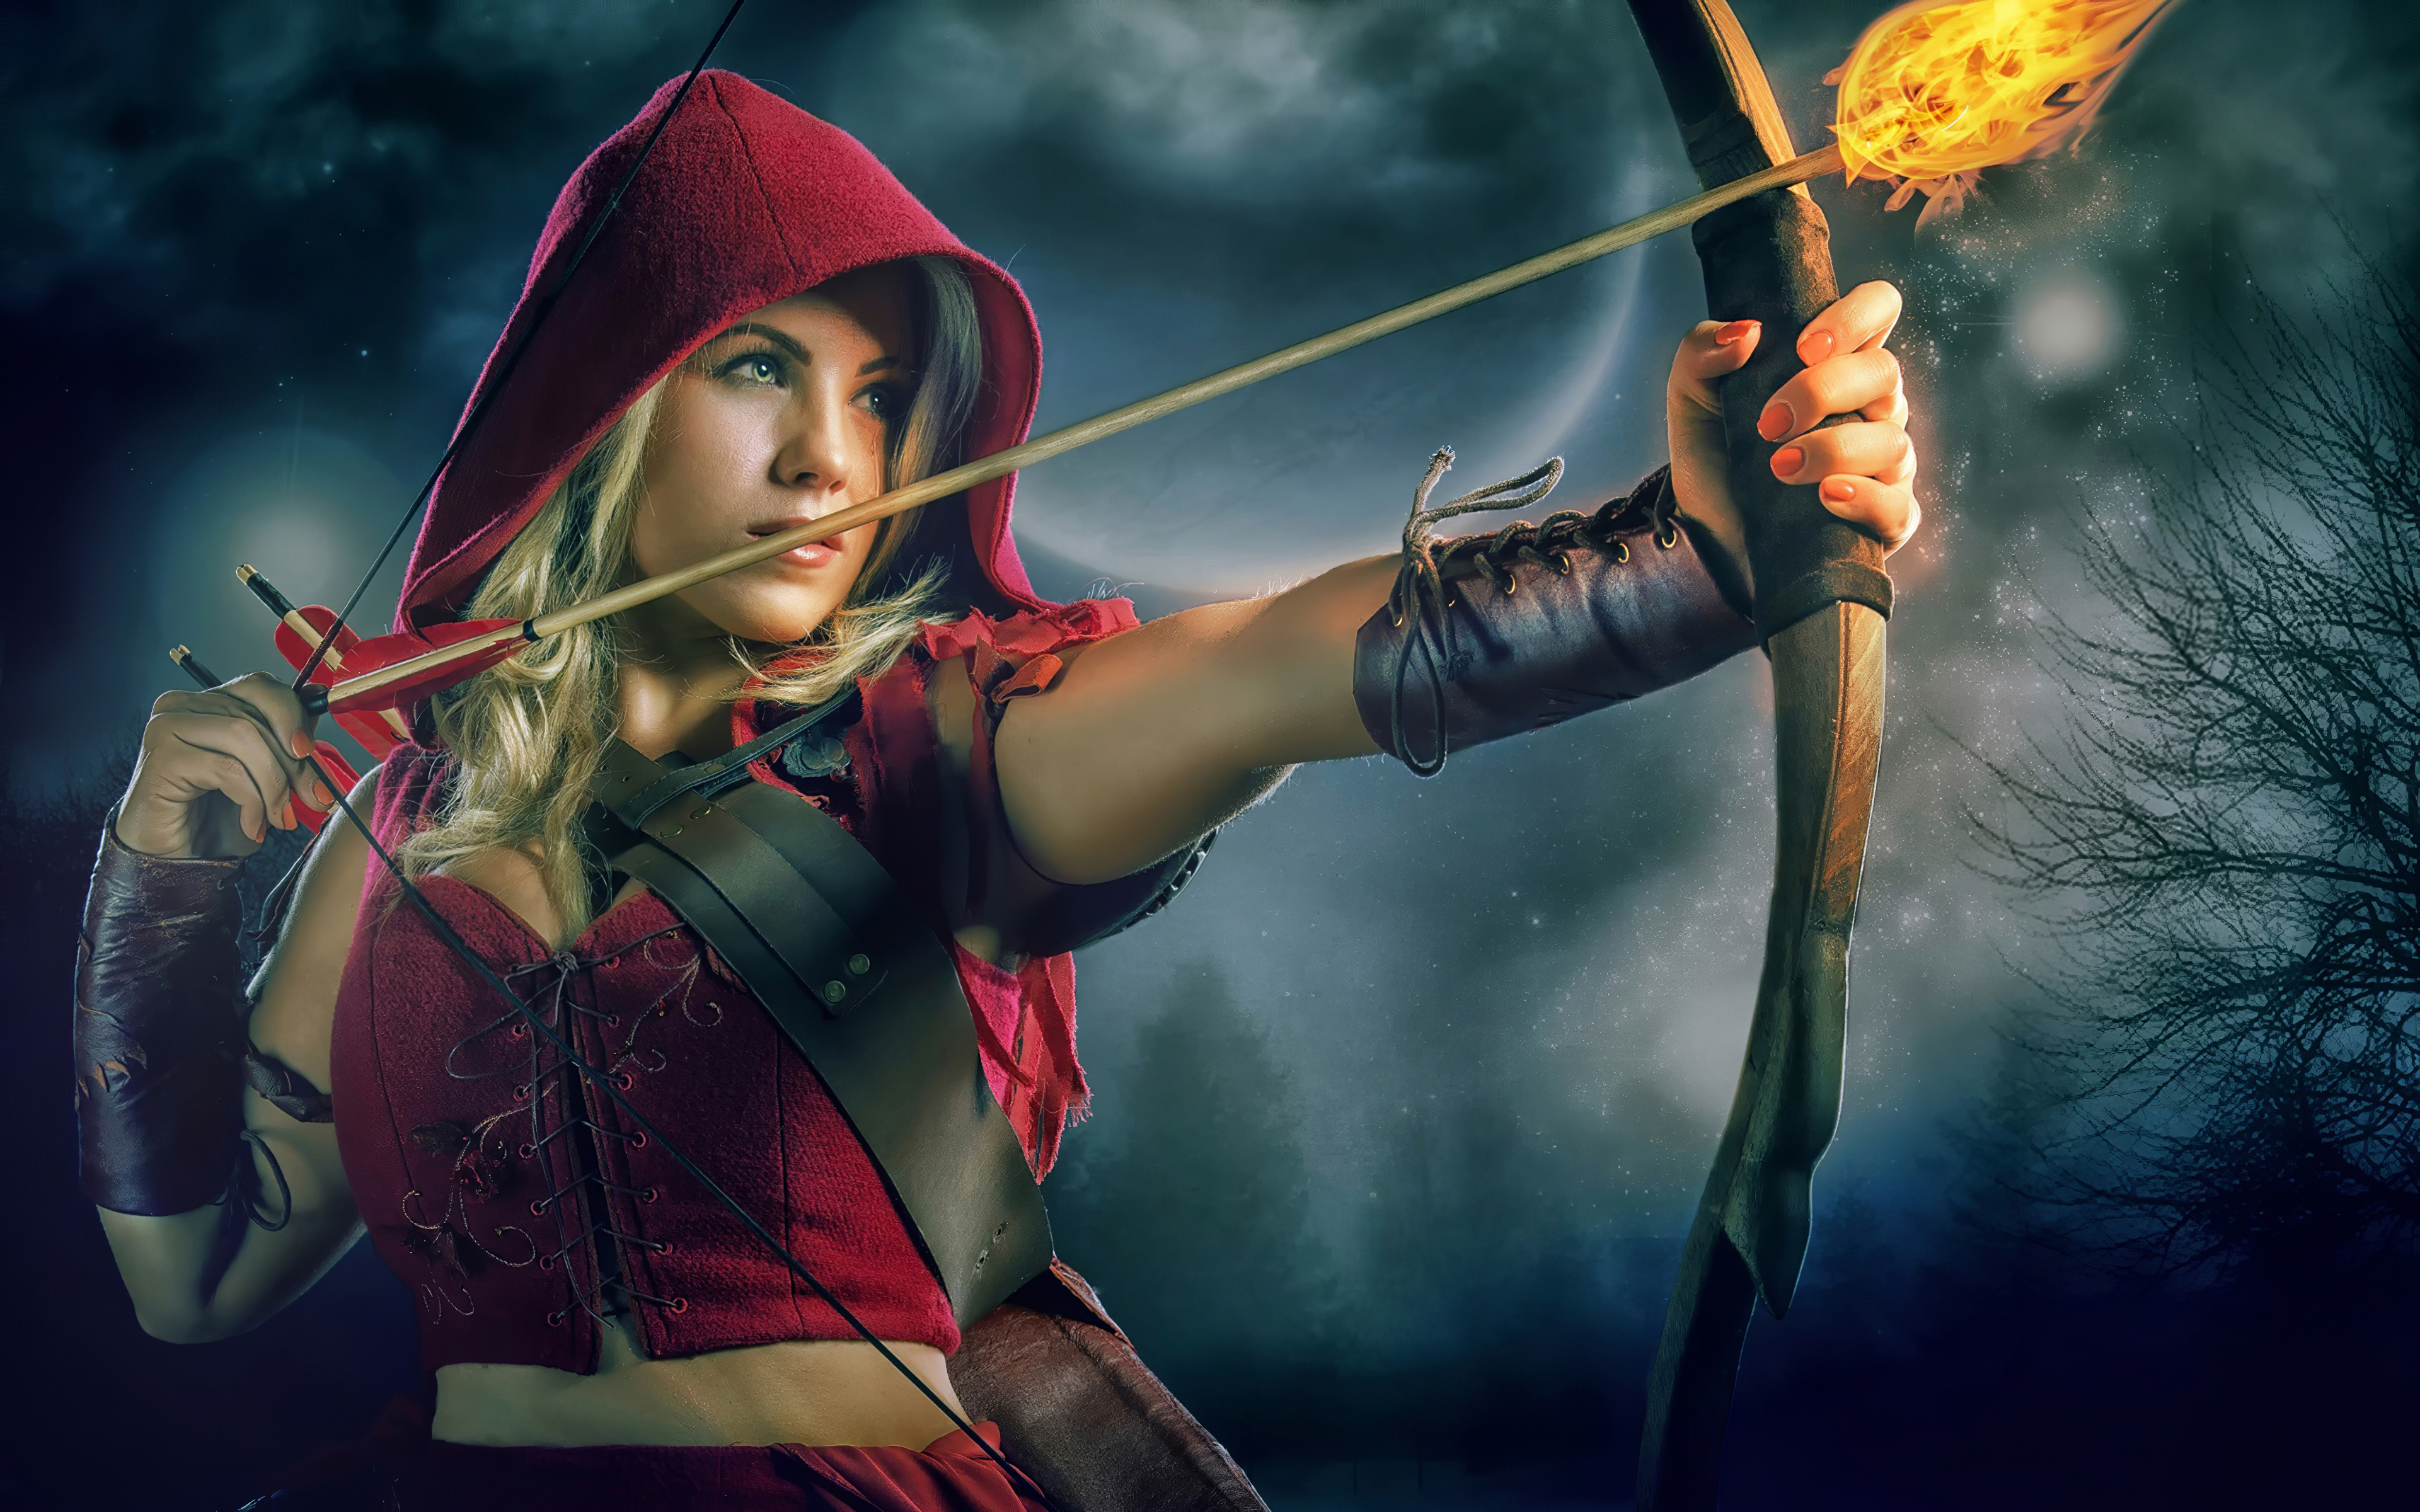 archer girl cosplay 4k 1616093369 - Archer Girl Cosplay 4k - Archer Girl Cosplay 4k wallpapers